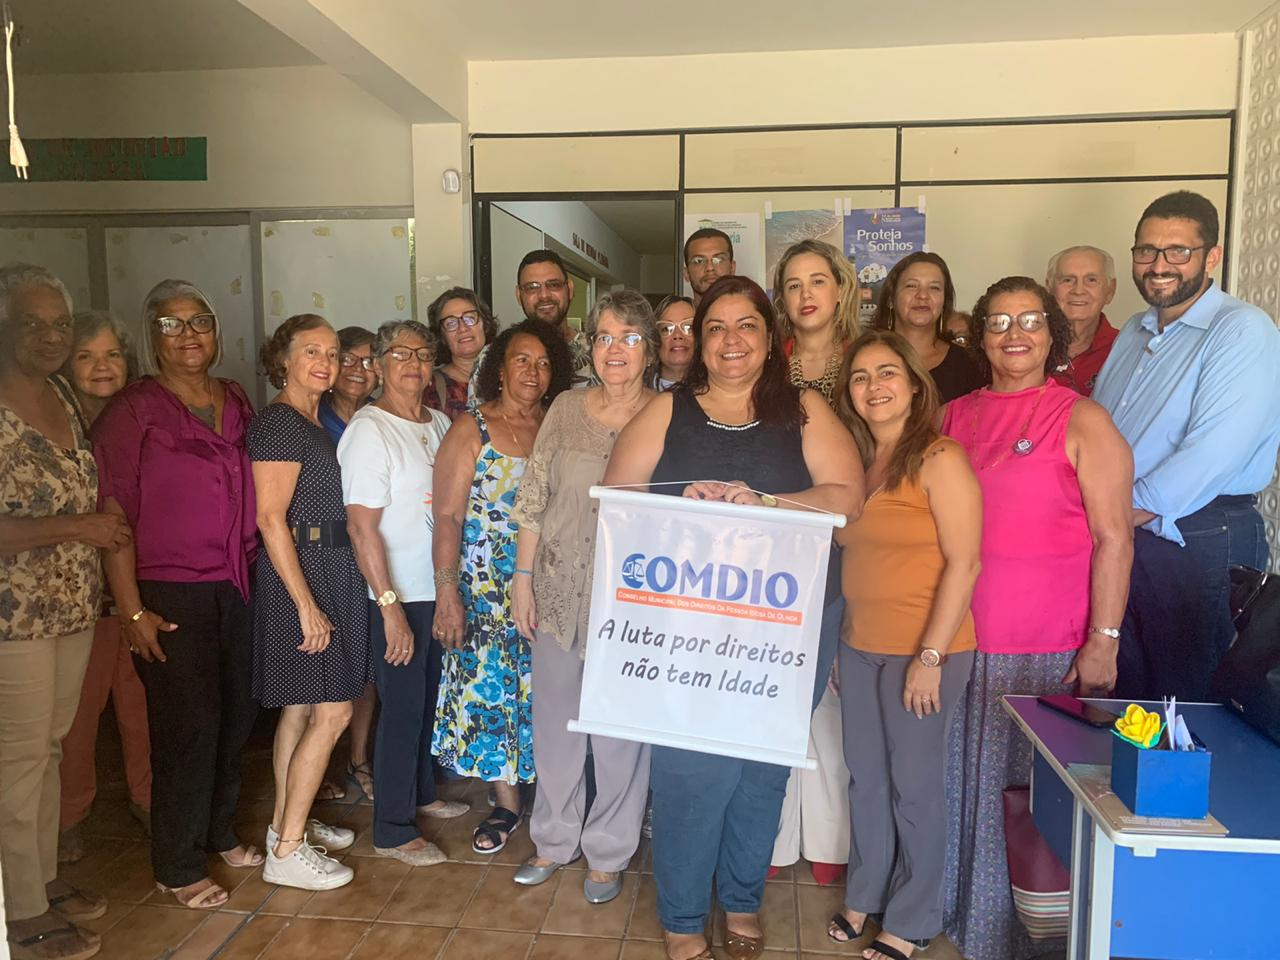 Prefeitura de Olinda nomeia membros do Comdio thumbnail